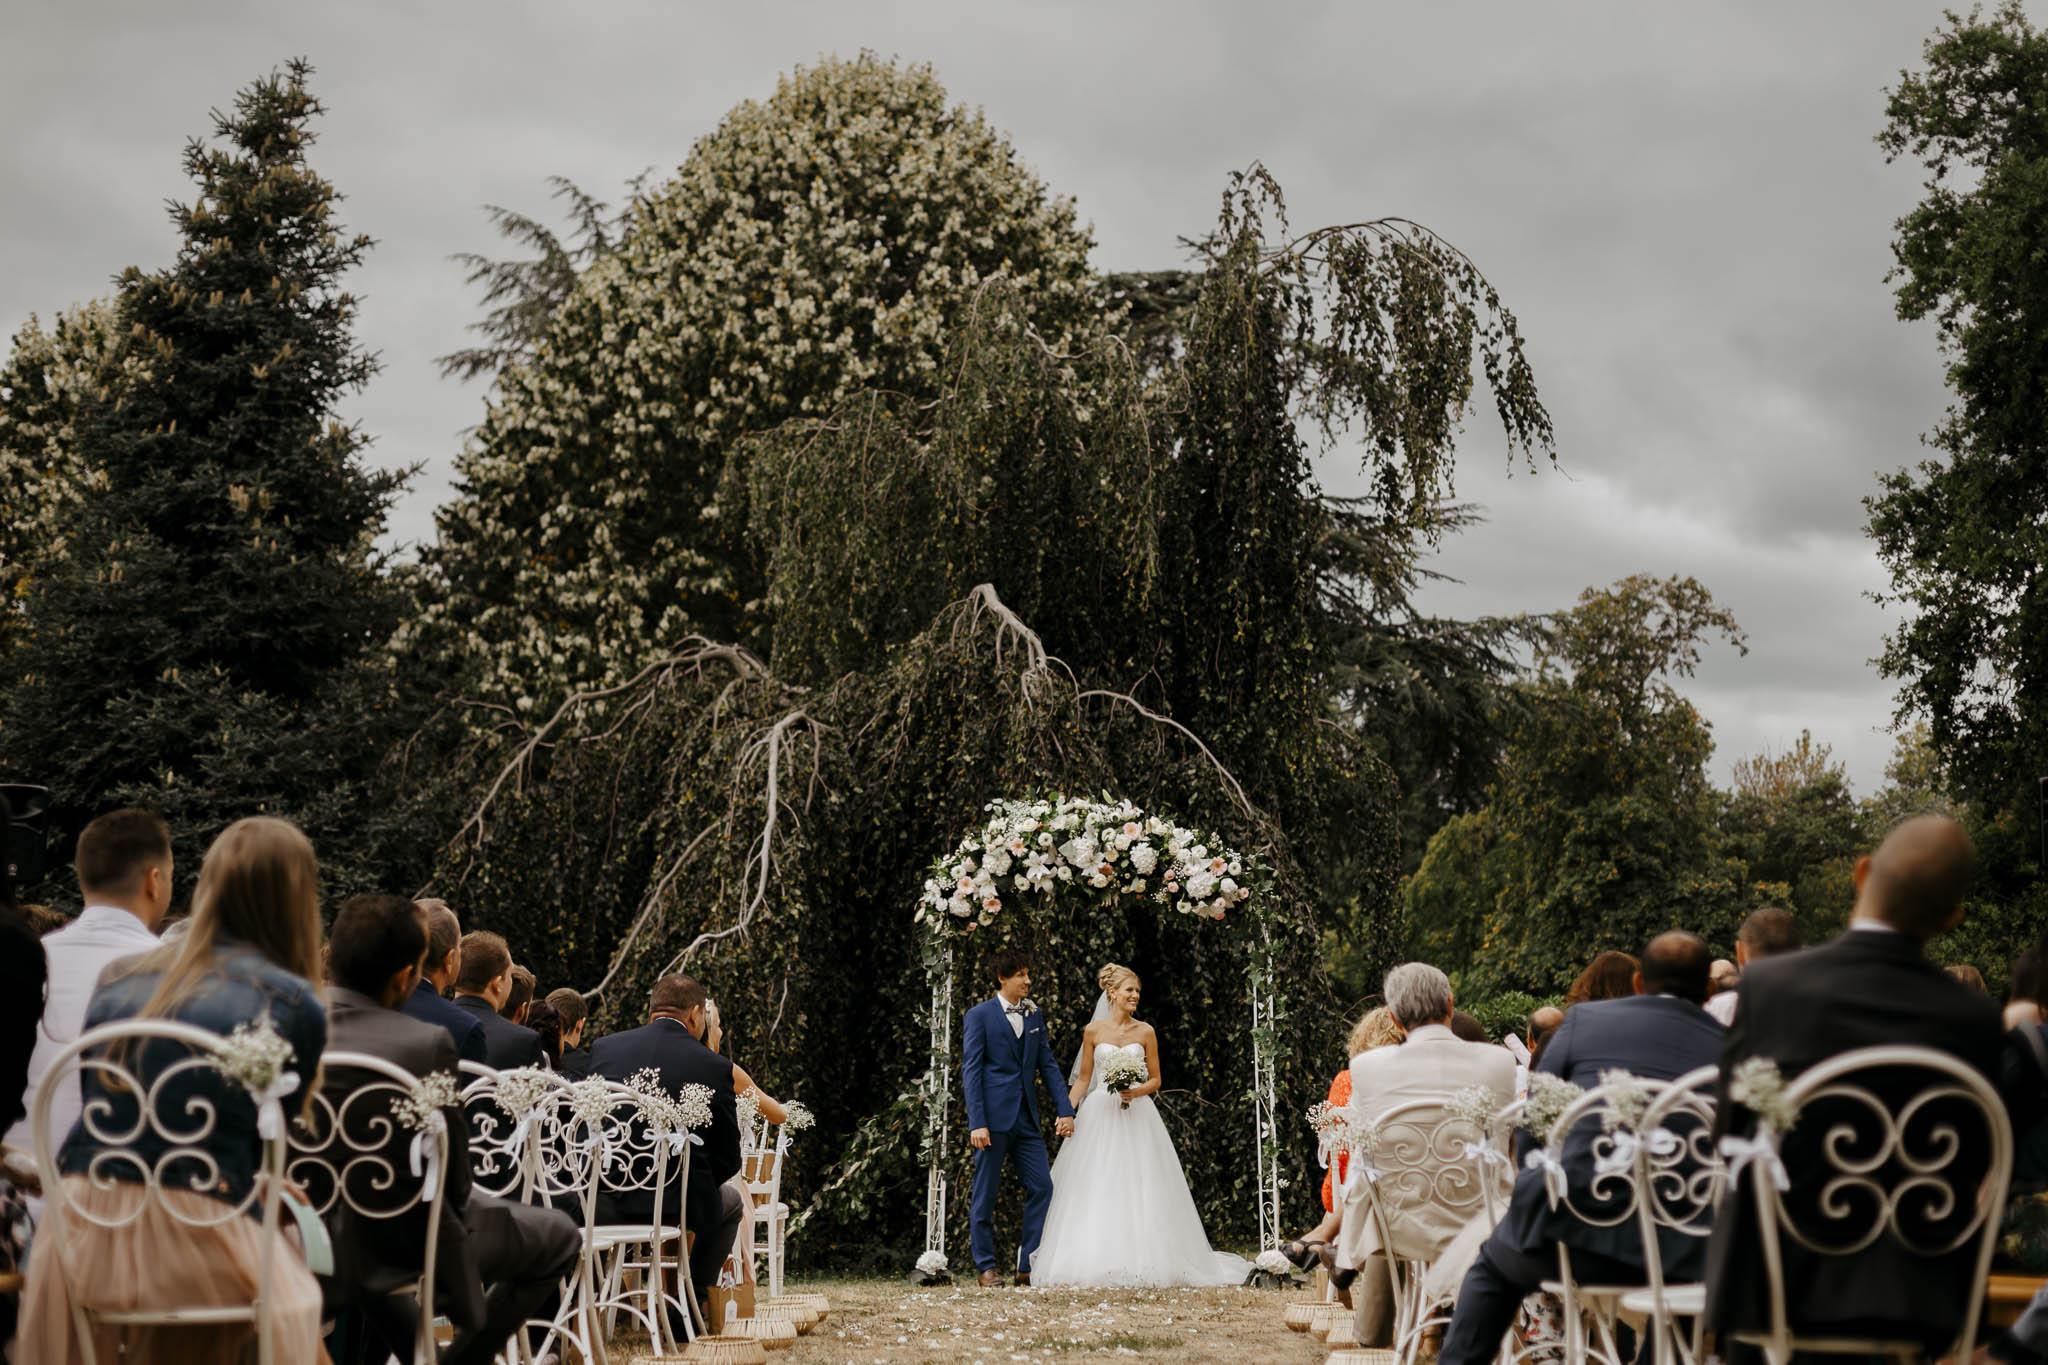 mariage-chateau-gaudras-ingold-37.jpg